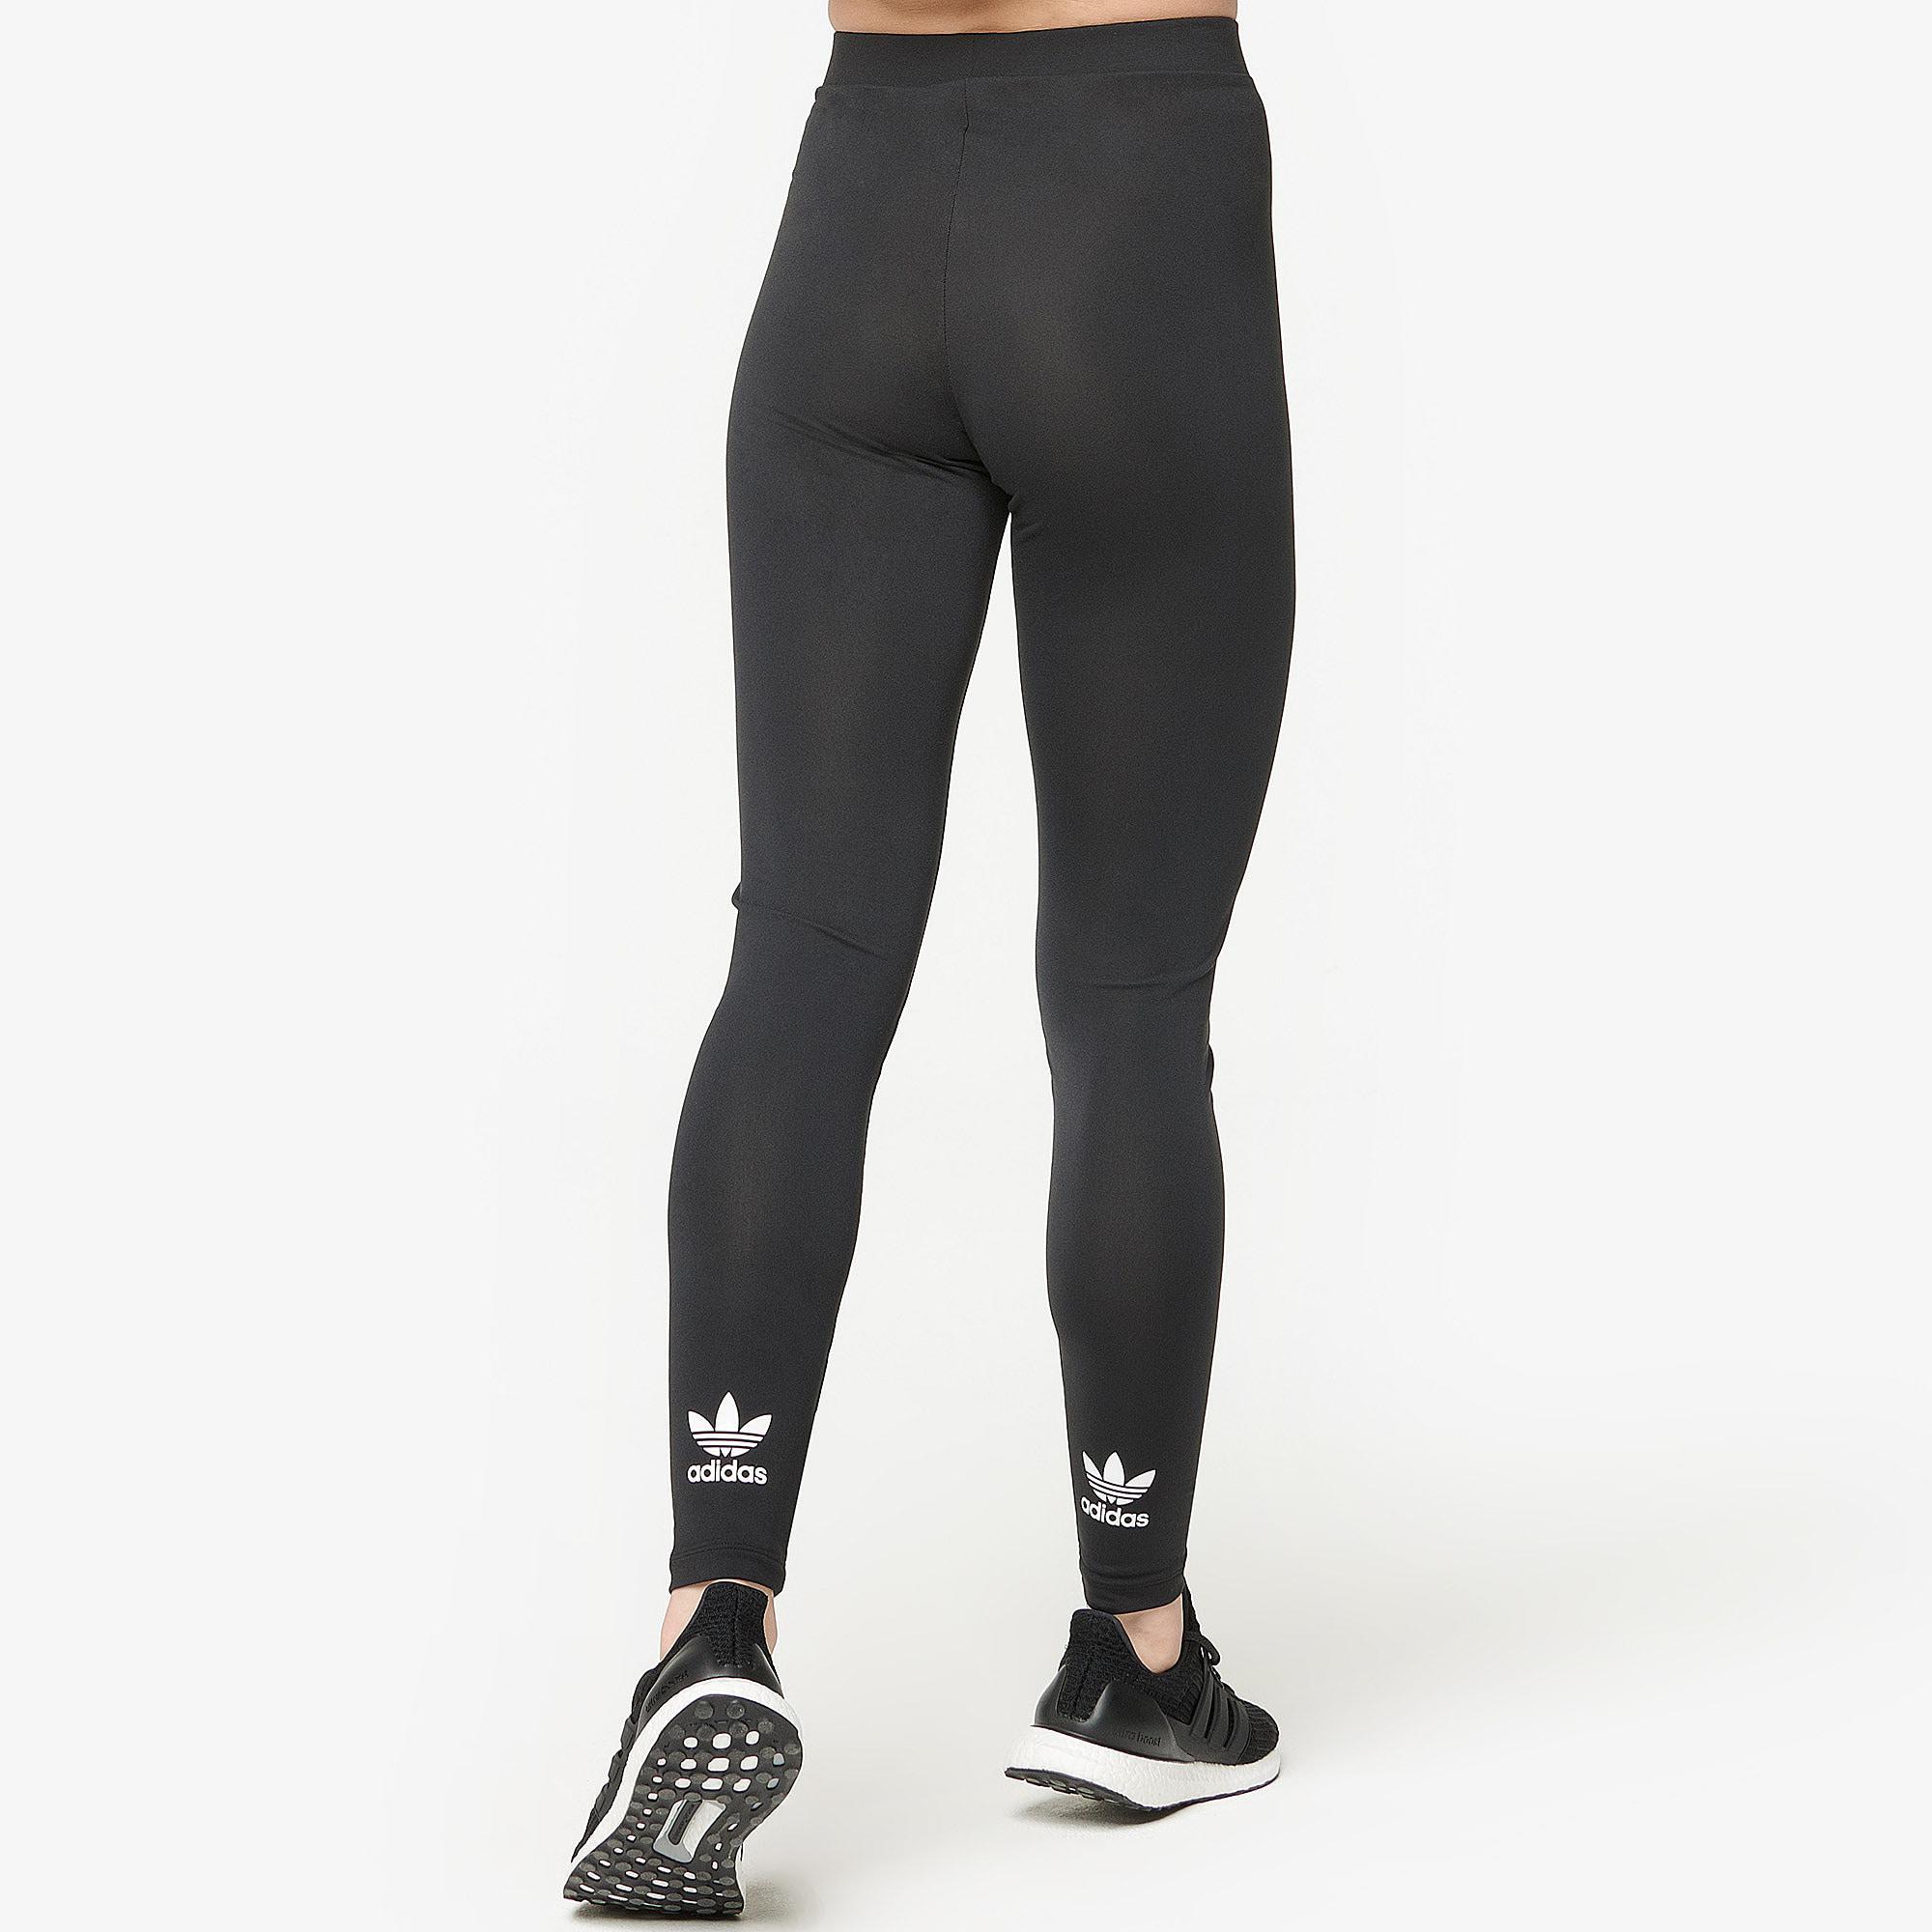 78629a21d71 Adidas Originals - Black Adicolor Trefoil Leggings - Lyst. View fullscreen